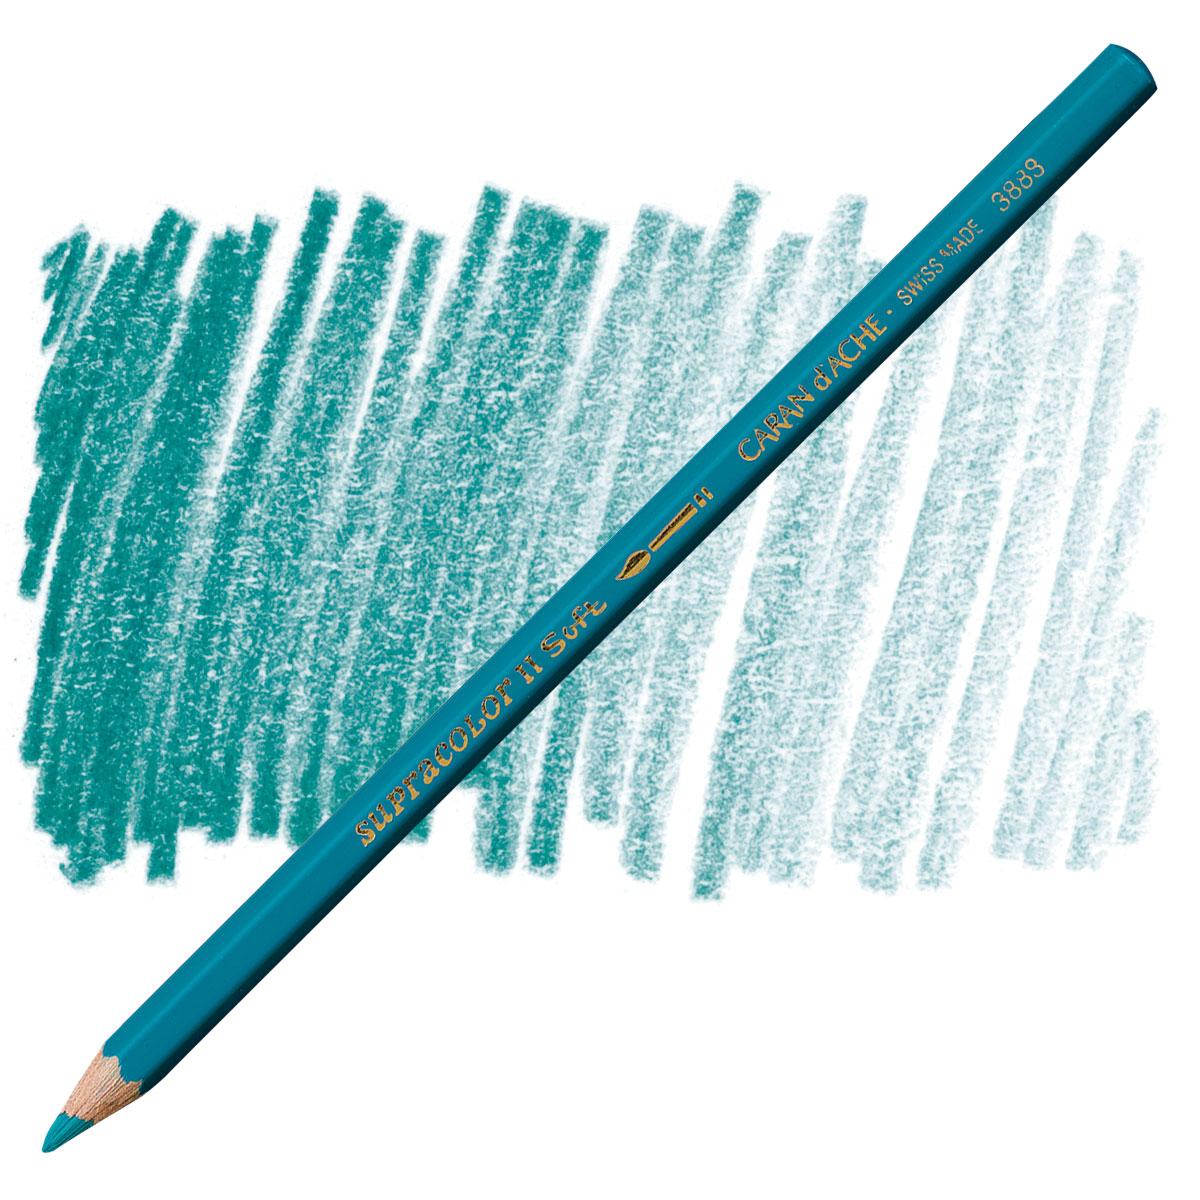 Caran d/'Ache Supracolor Soft Watersoluble Pencil Empire Green